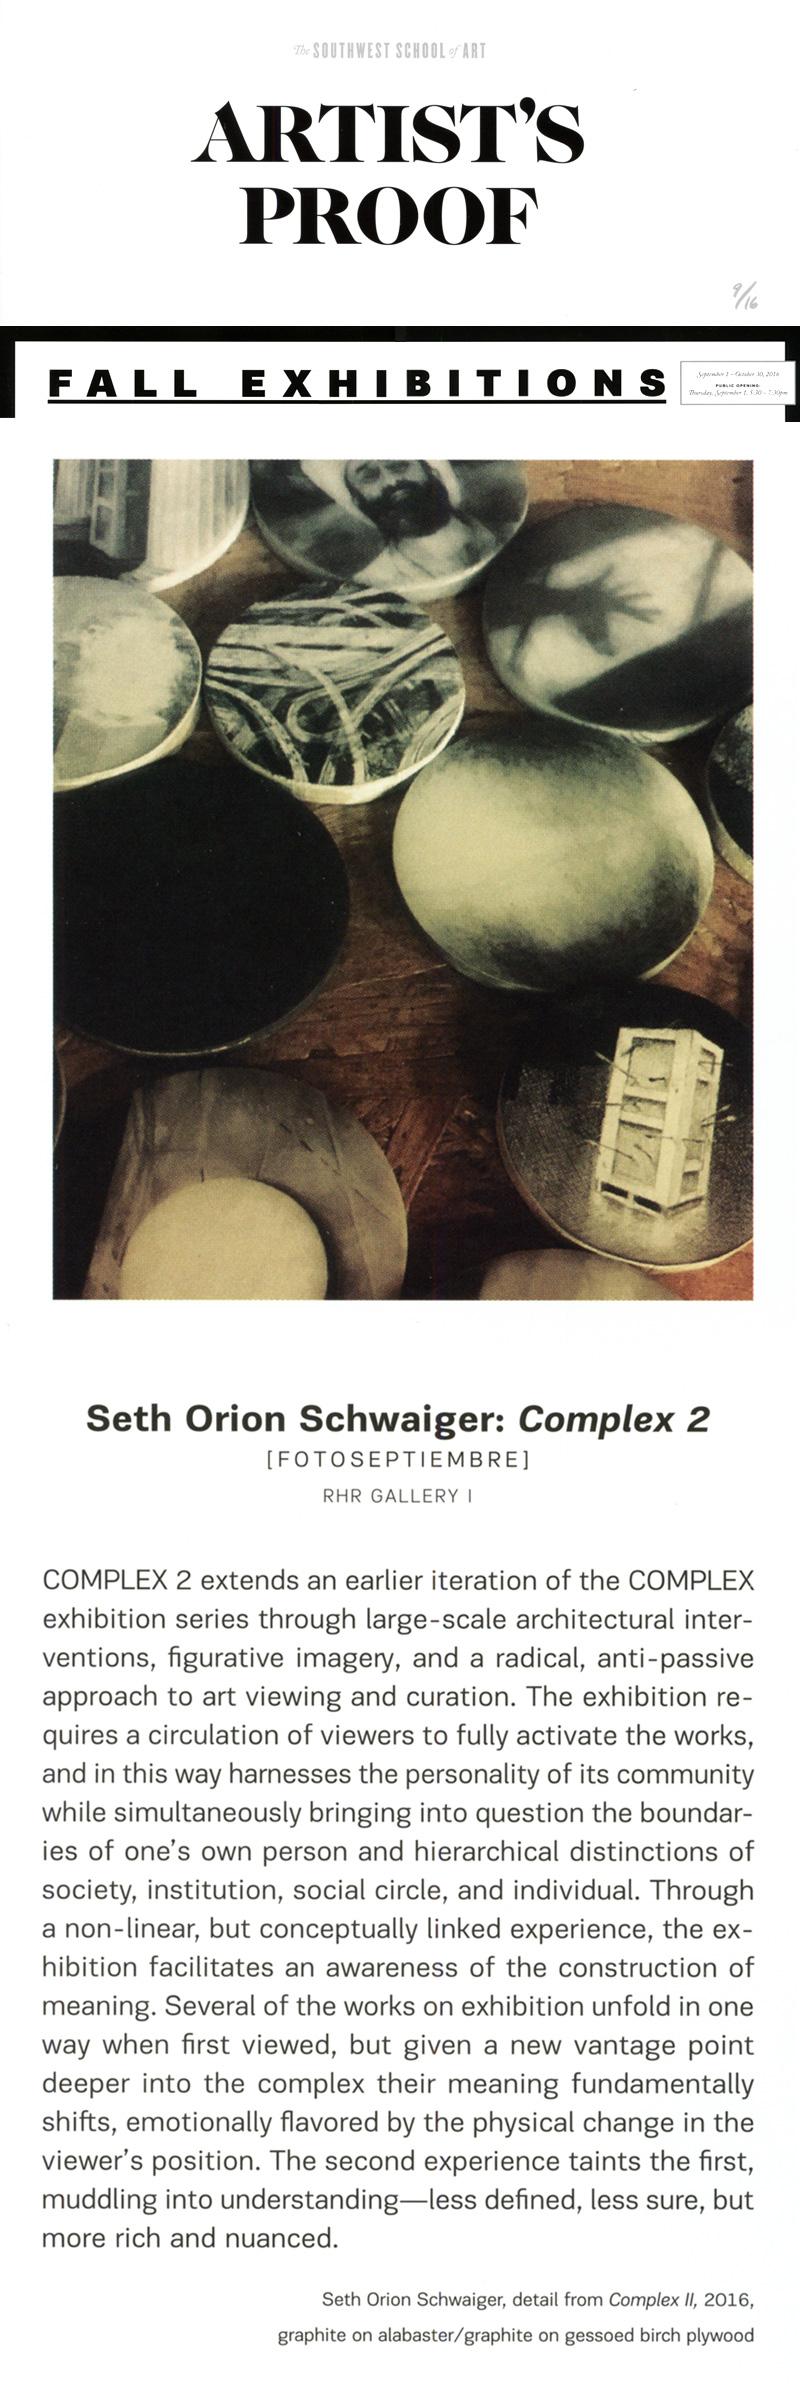 2016-fotoseptiembre-usa_press-archives_southwest-school-of-art_seth-orion-schwaiger_artists-proof